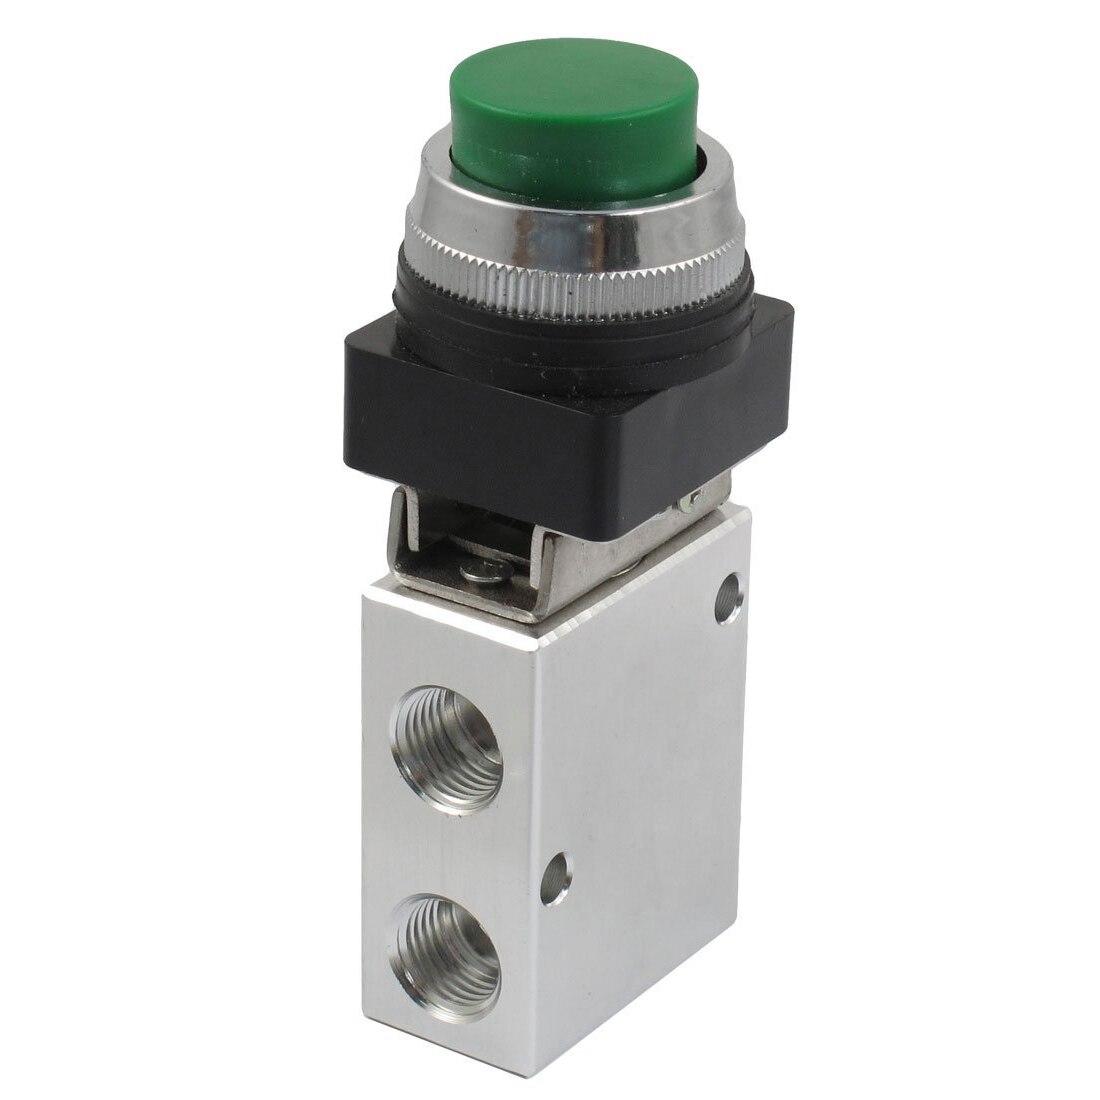 JM-322PPL 13mm Thread 2 Position 3 Way Green Push Button Air Mechanical Valve air conditioner part 3 way valve 1 4npt thread single manifold gauge 220psi